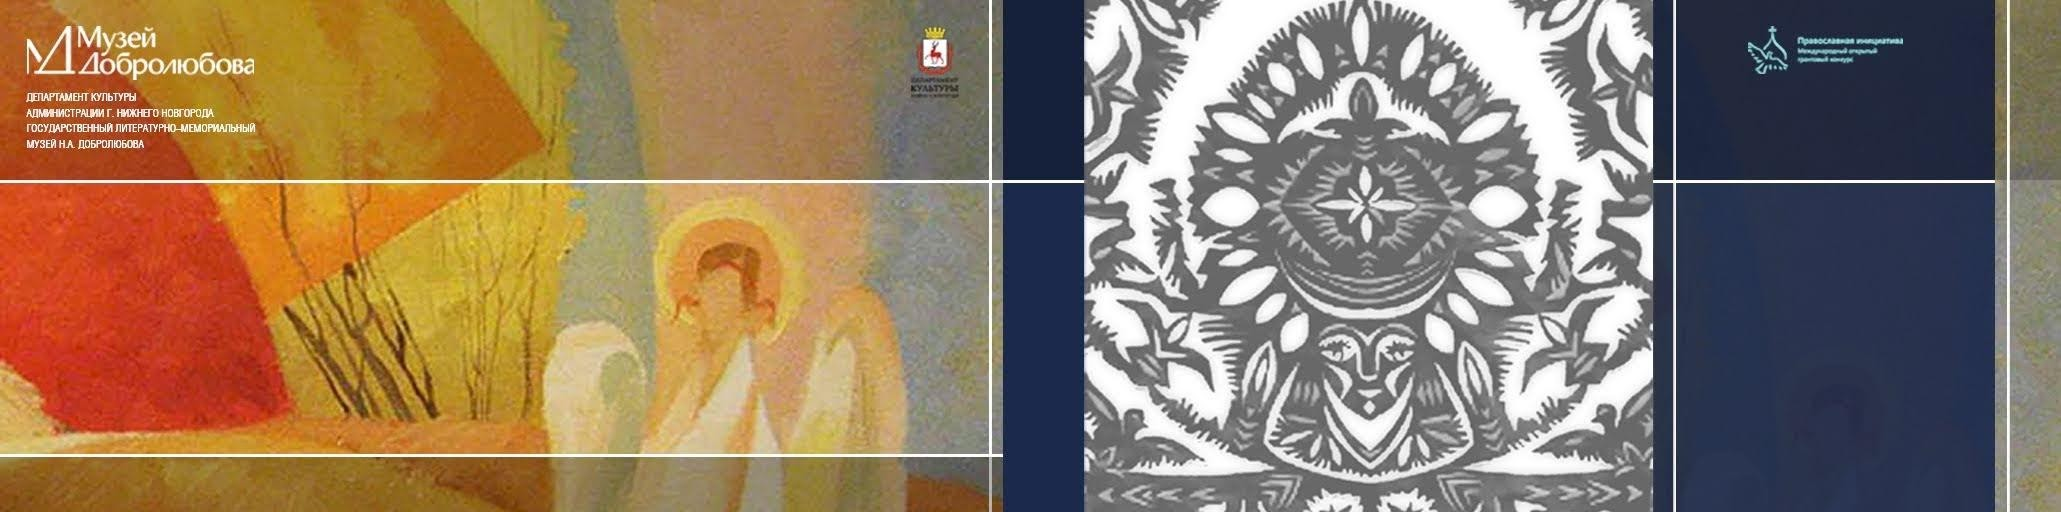 Нижегородский музей Н.А. Добролюбова запустил цикл презентаций «Семейное сотворчество: рука об руку»